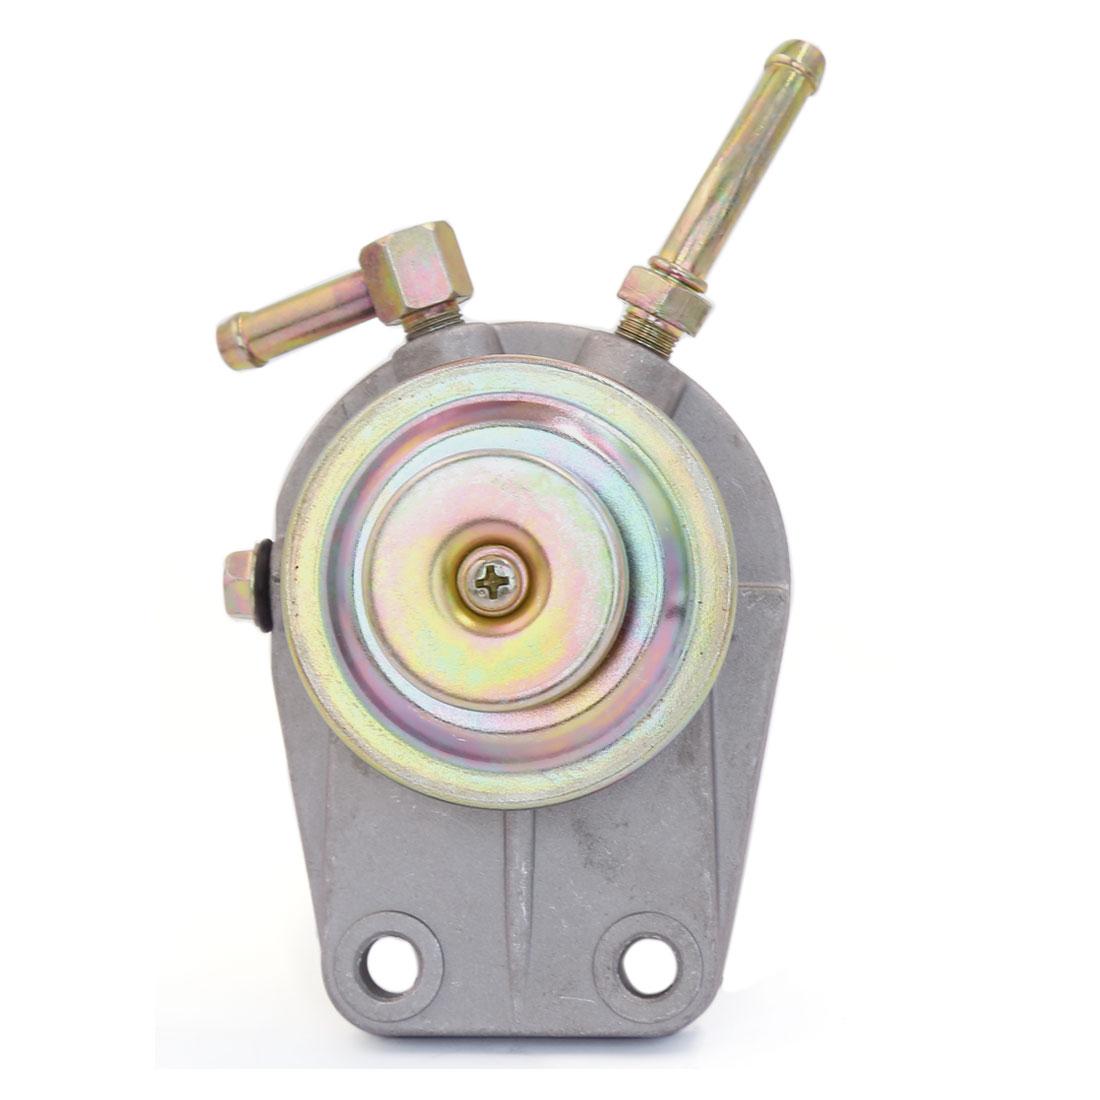 Metal Submersible Transfer Pump Water Oil Fuel Fluids Separator for JK024